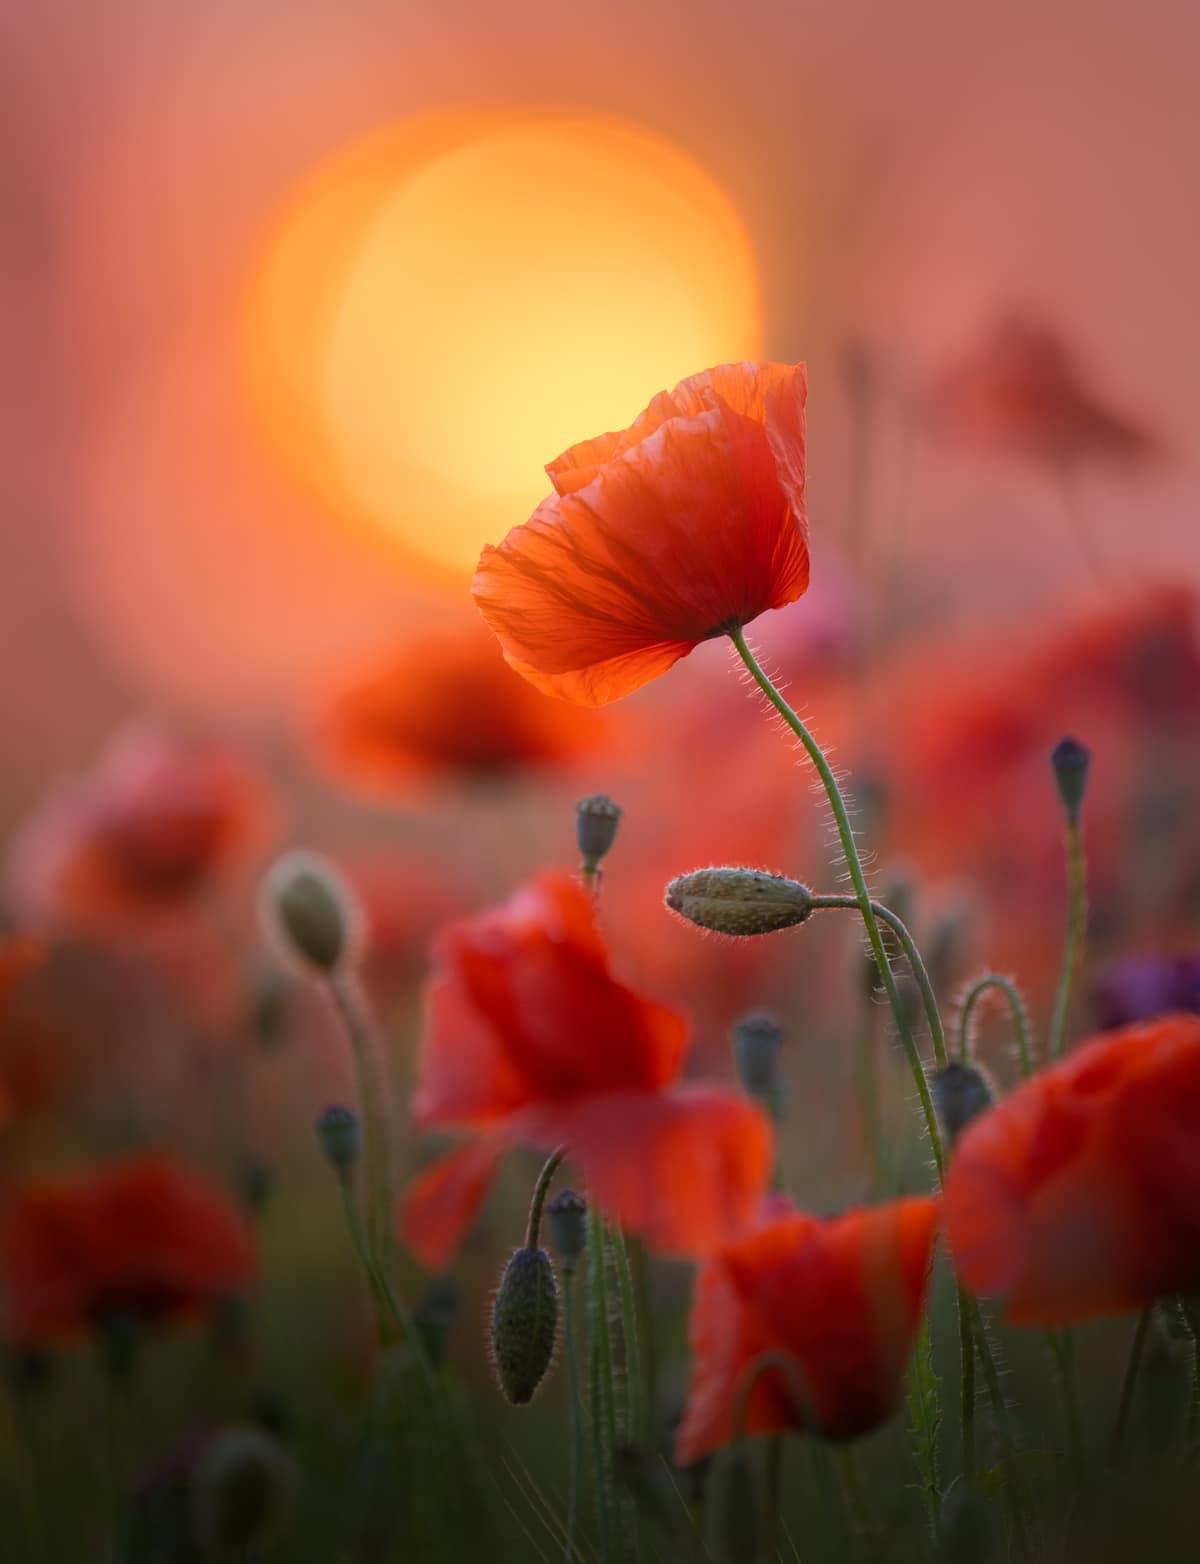 Poppy in Bloom in the Netherlands